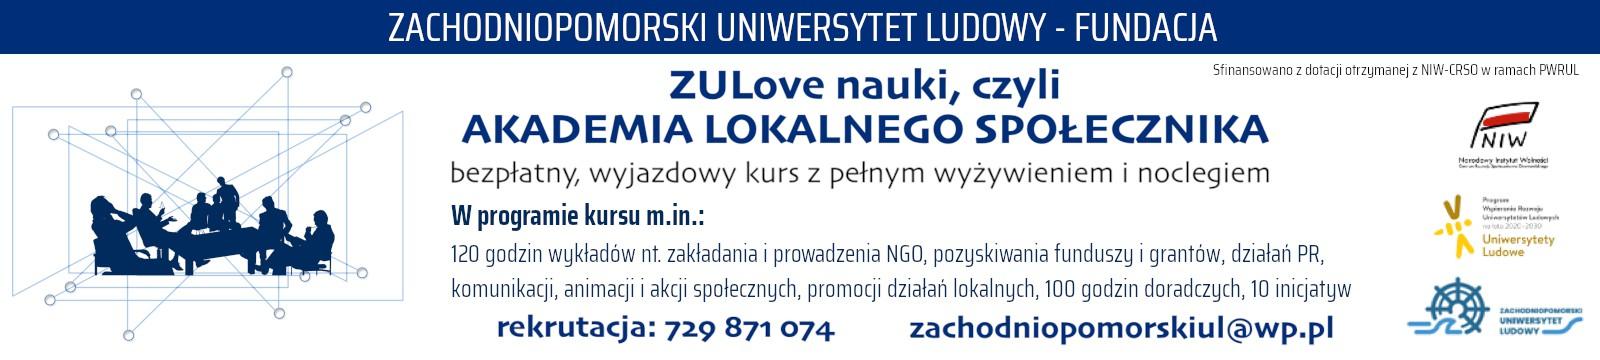 reklama | Zachodniopomorski Uniwersytet Ludowy - Fundacja